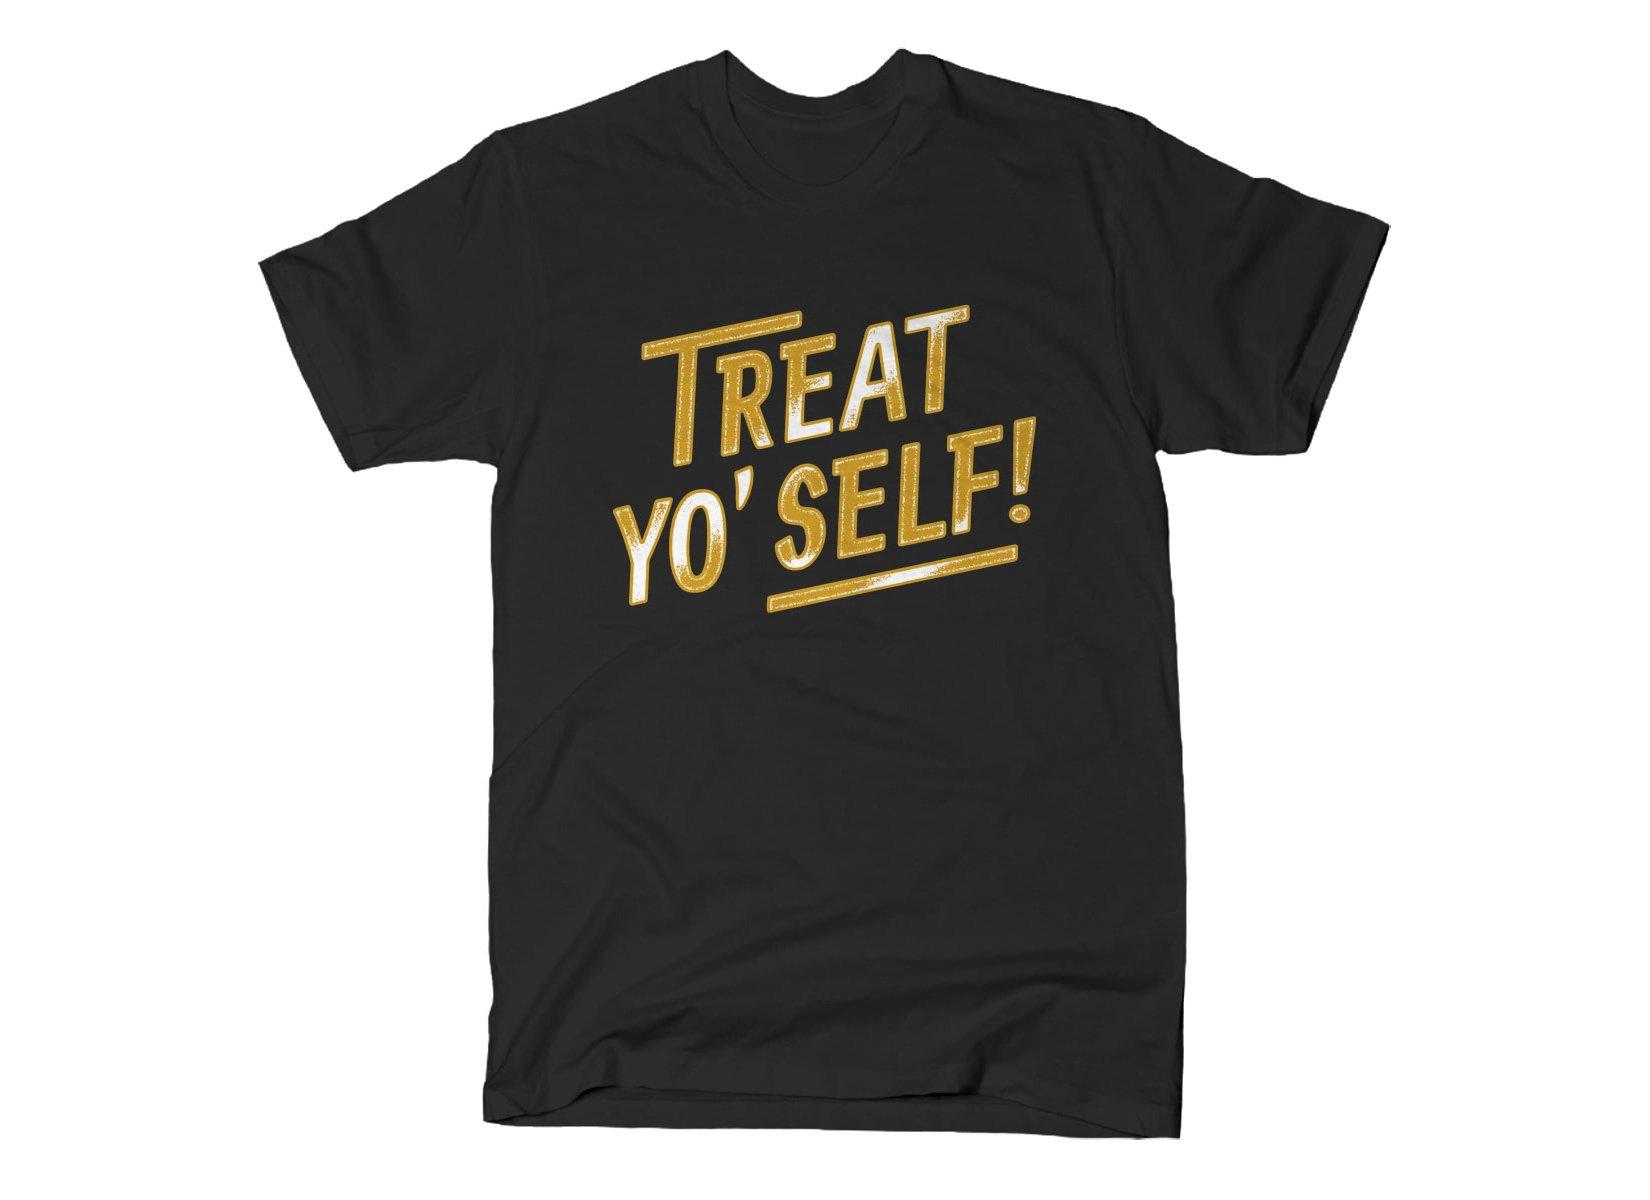 Treat Yo' Self! on Mens T-Shirt